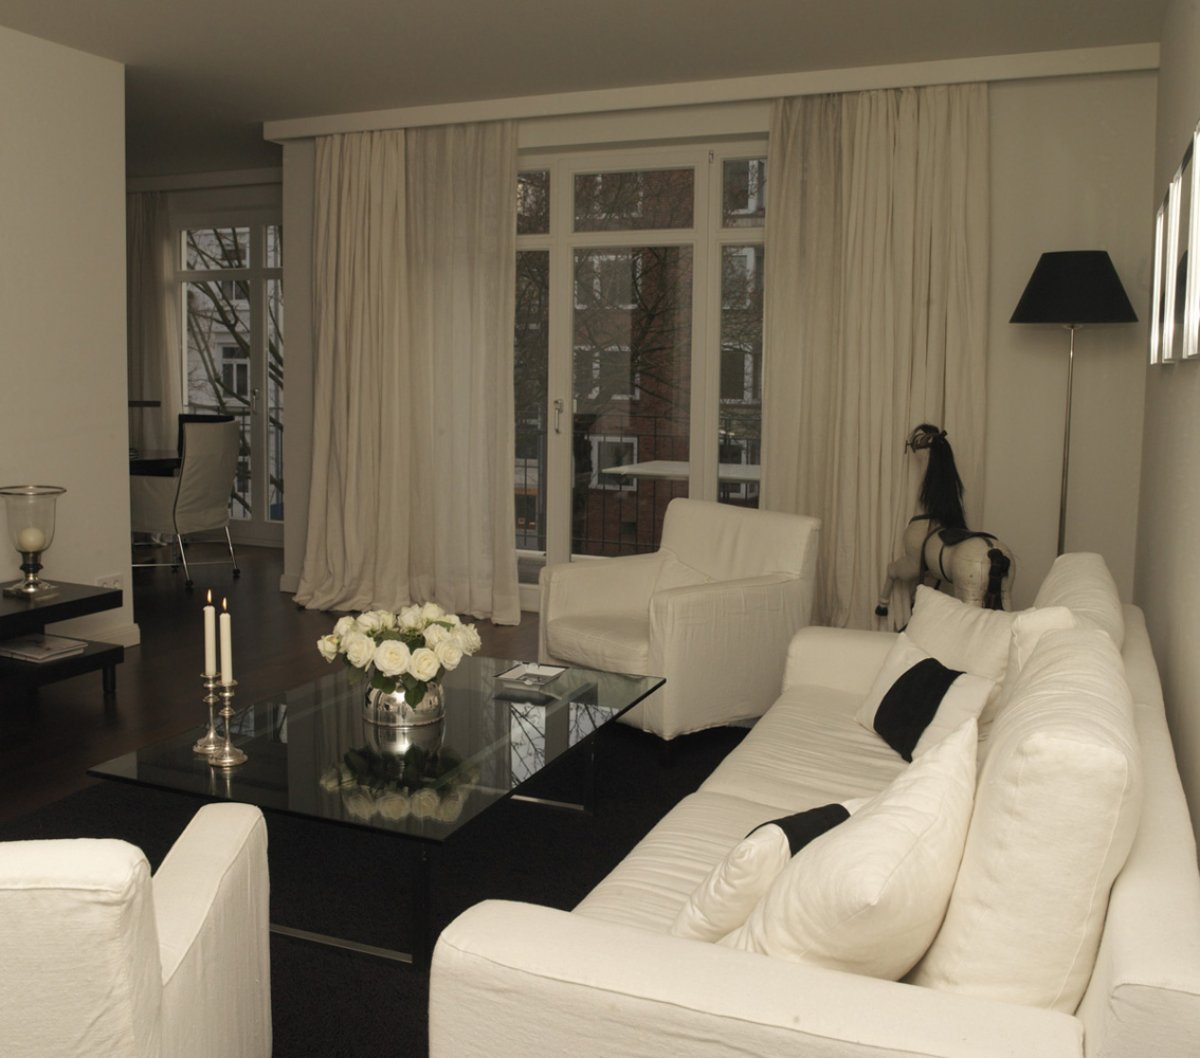 projekt neues apartment in hamburg ullibel ihr spezialistenteam f r exklusive. Black Bedroom Furniture Sets. Home Design Ideas